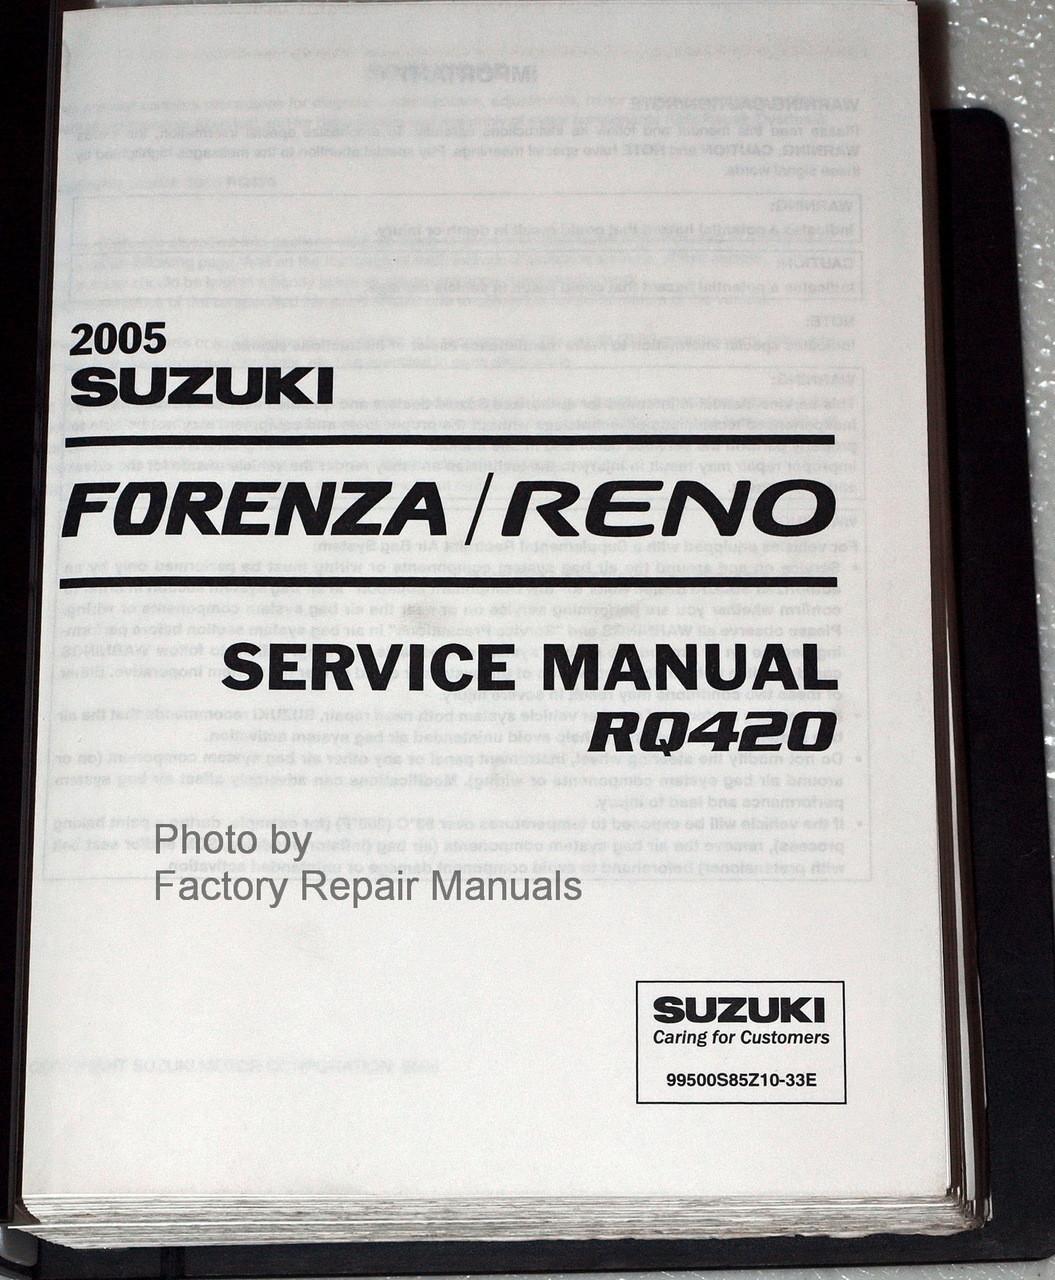 Bestseller  07 Suzuki Forenza Owners Manual